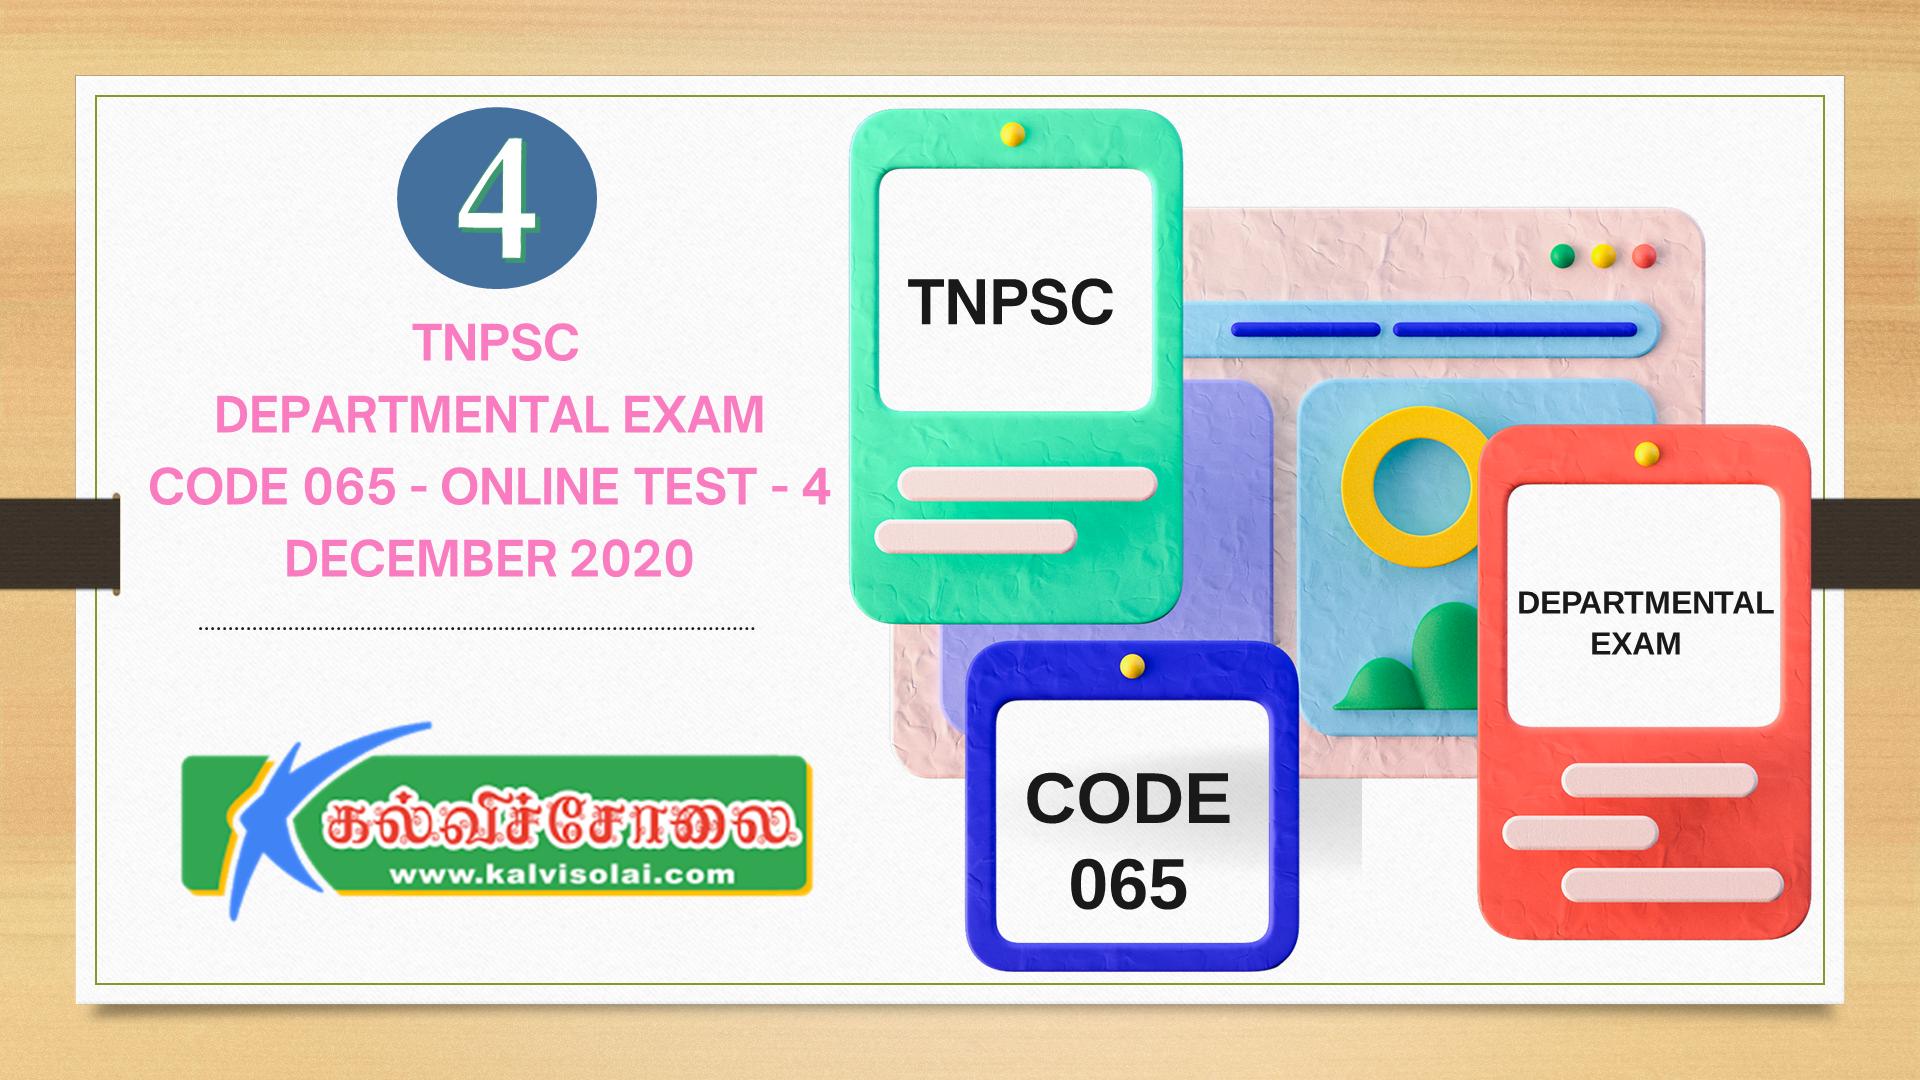 kalvisolai-kalviseihi-padasalai-kalvikural-kaninikkalvi-TNPSC DEPARTMENTAL EXAM - CODE 065 - ONLINE TEST - 4